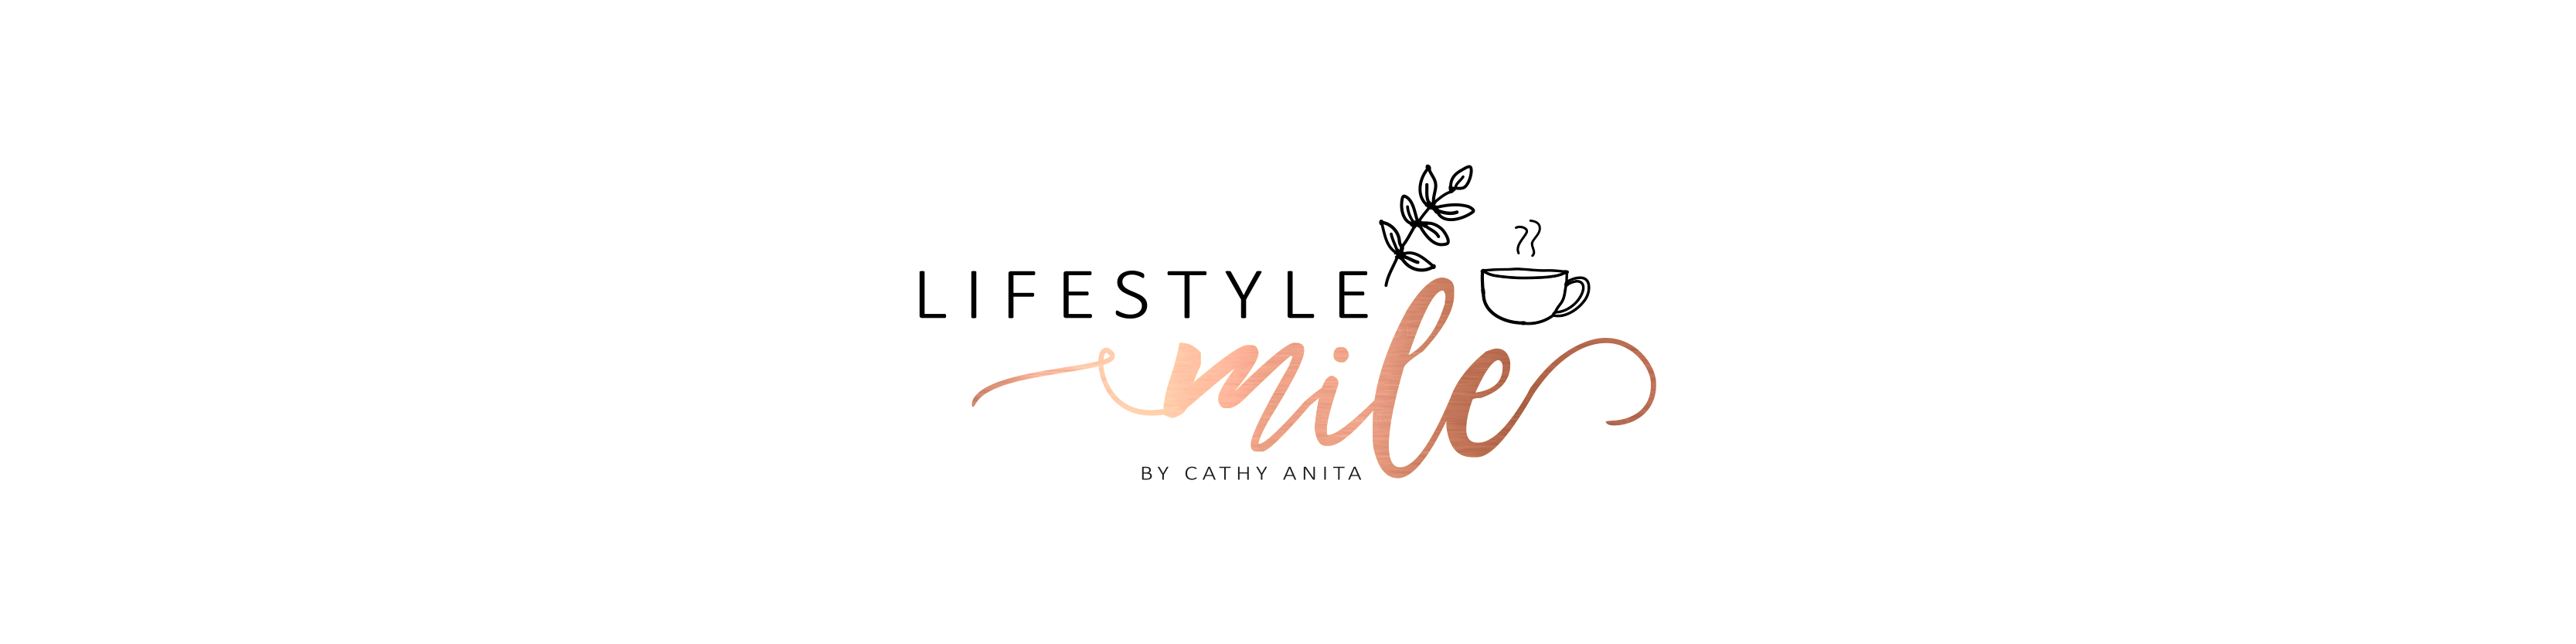 lifestylemile.com